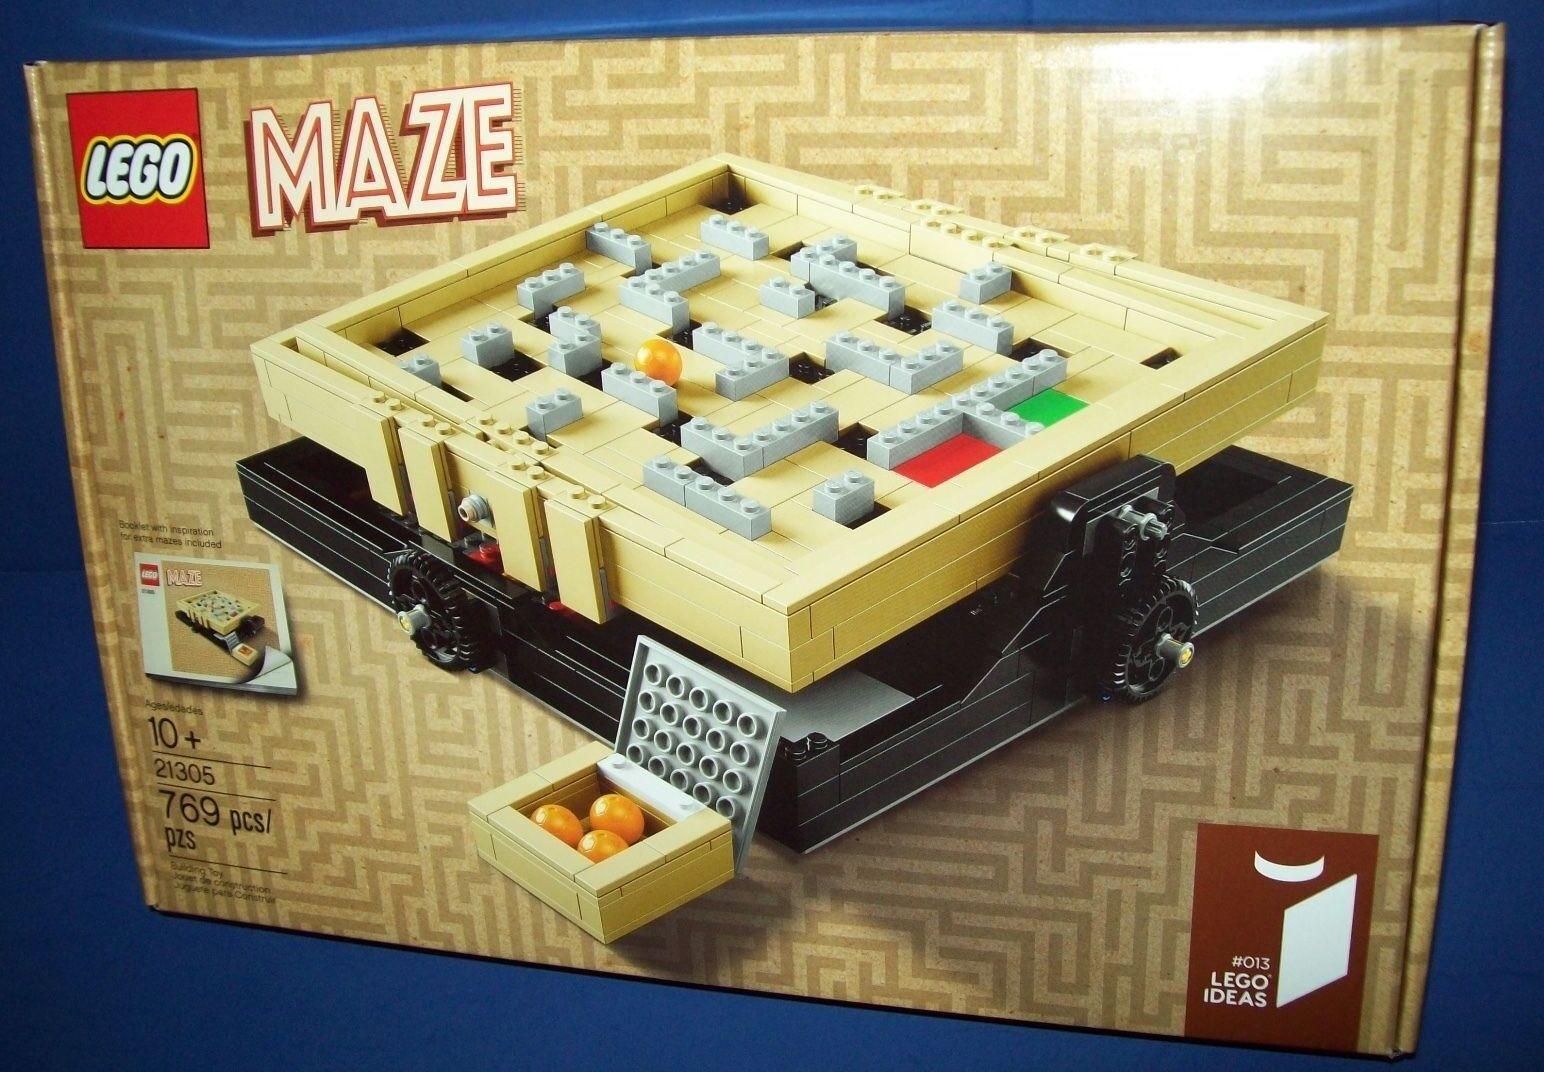 LEGO 21305  IDEAS CUUSOO  MAZE  Nuova lista